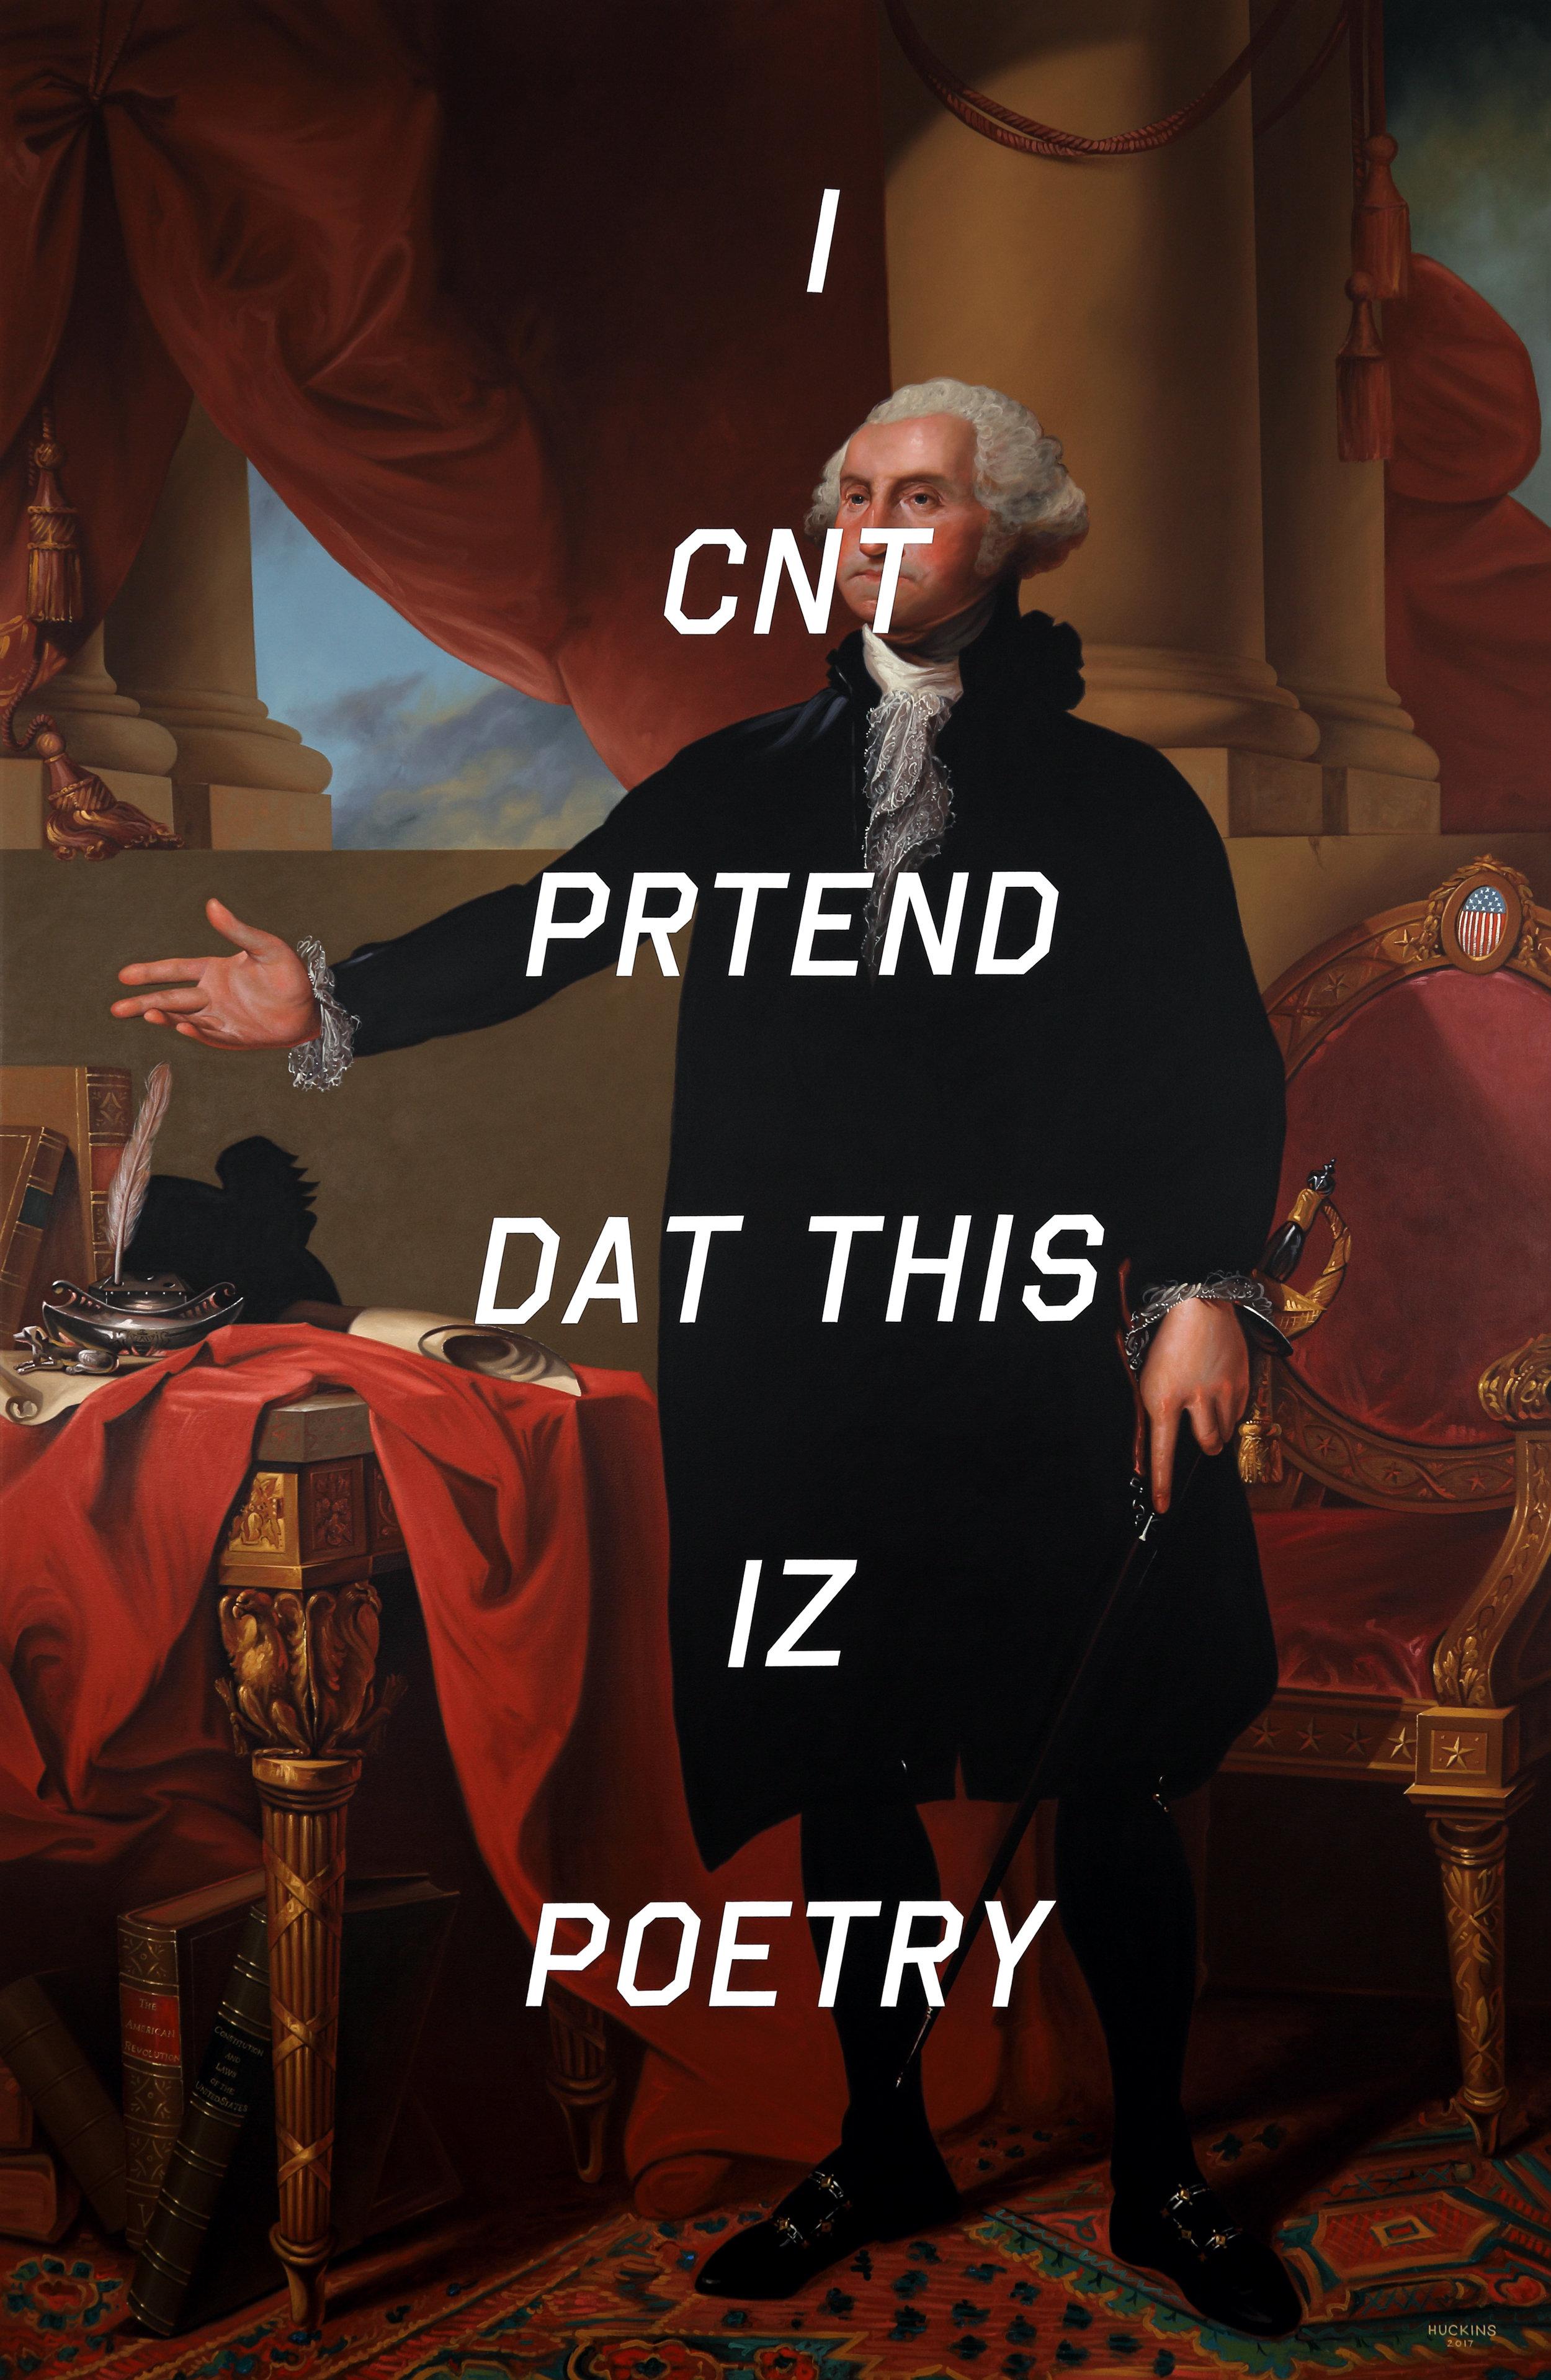 KContemporaryArt_Huckins_George Washington (The Lansdowne Portrait), I Can't Pretend That This Is Poetry_2017_AcrylicOnCanvas_84x54_26000.jpg